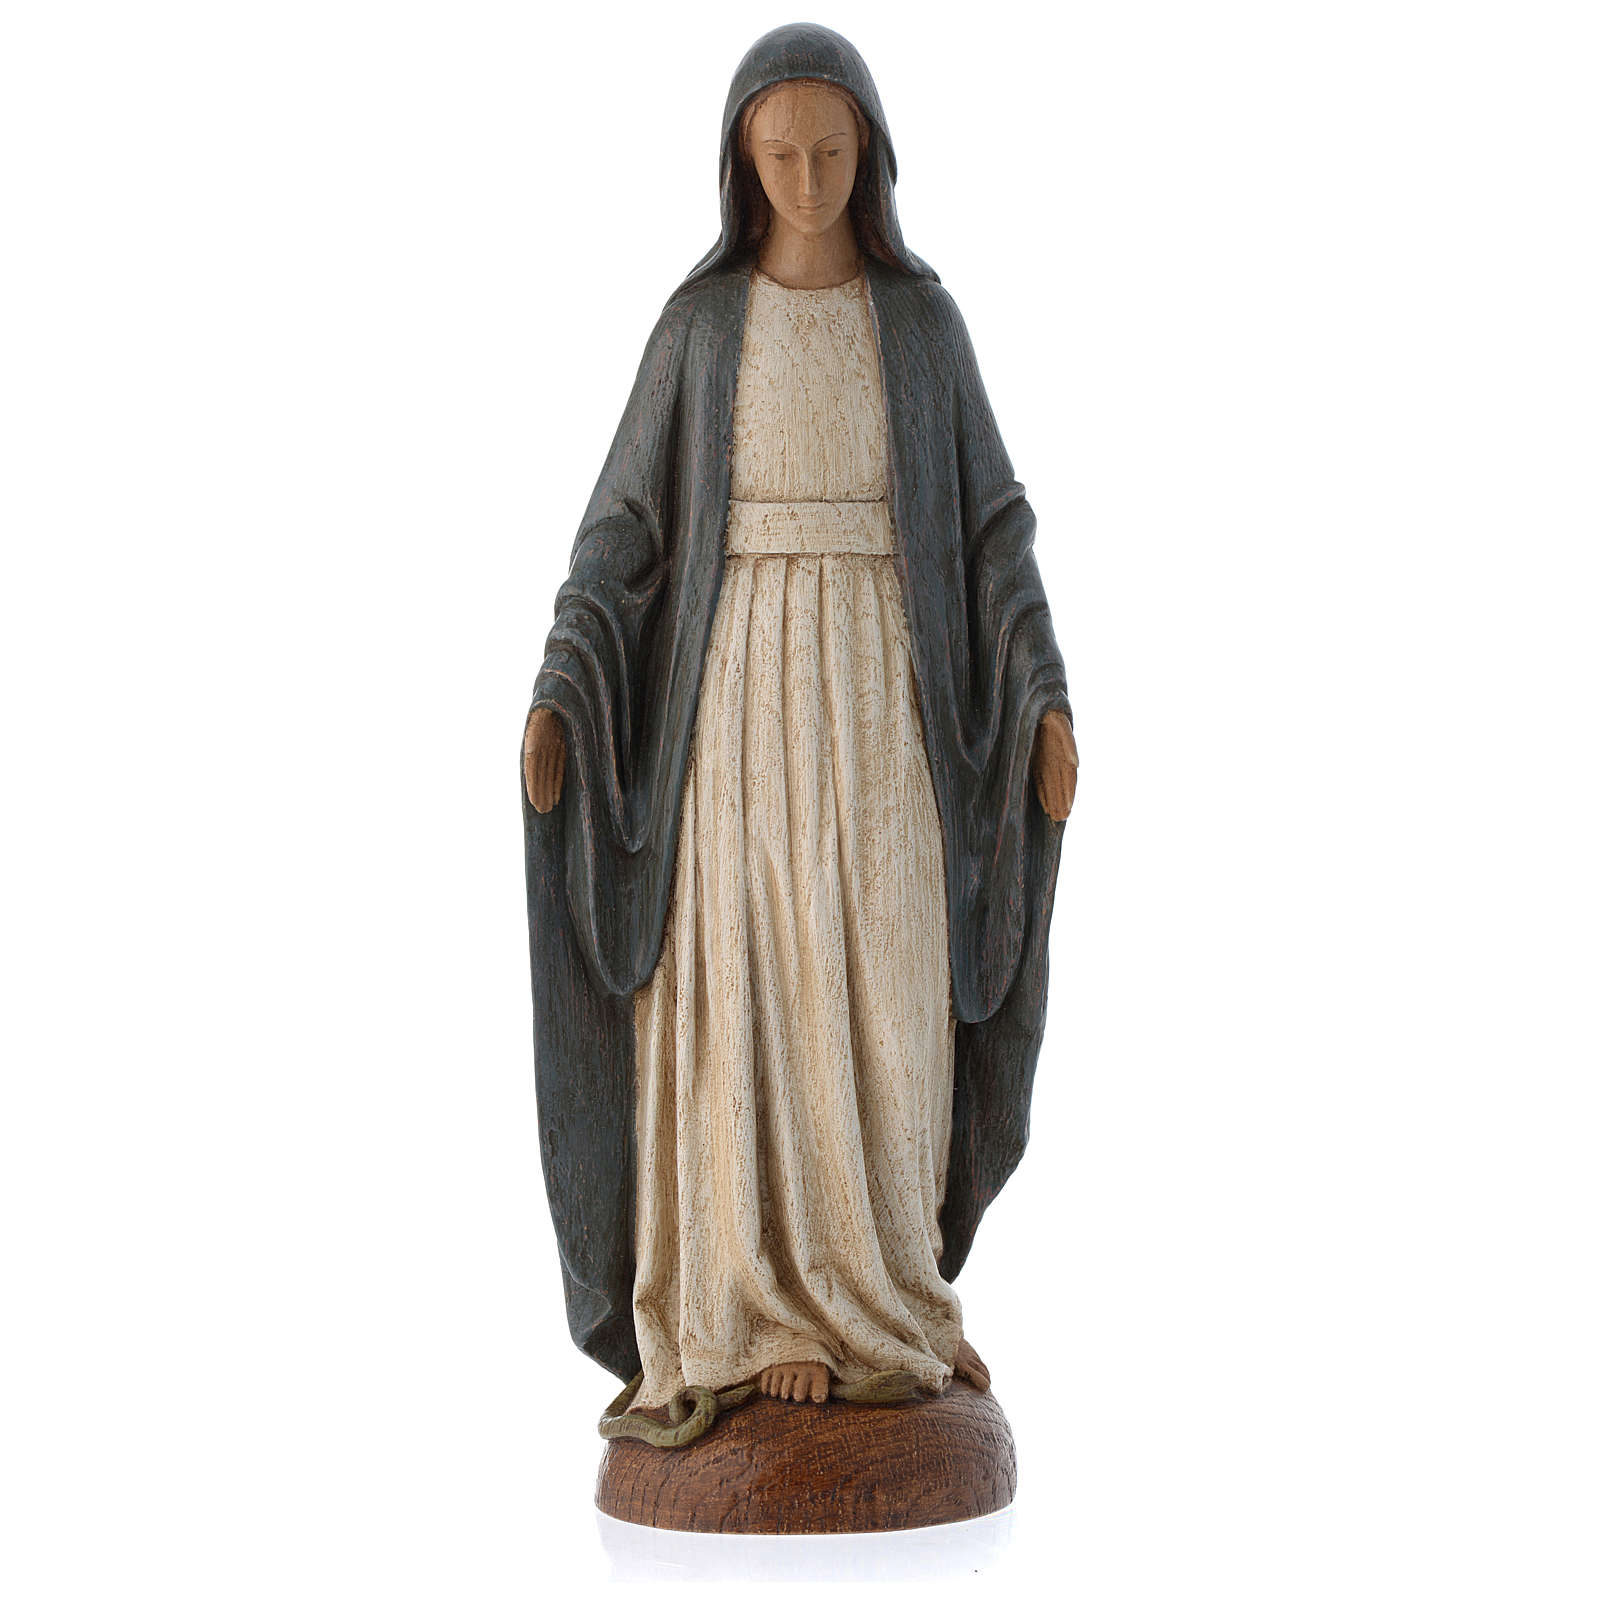 Madonna de la Rue du Bac 4